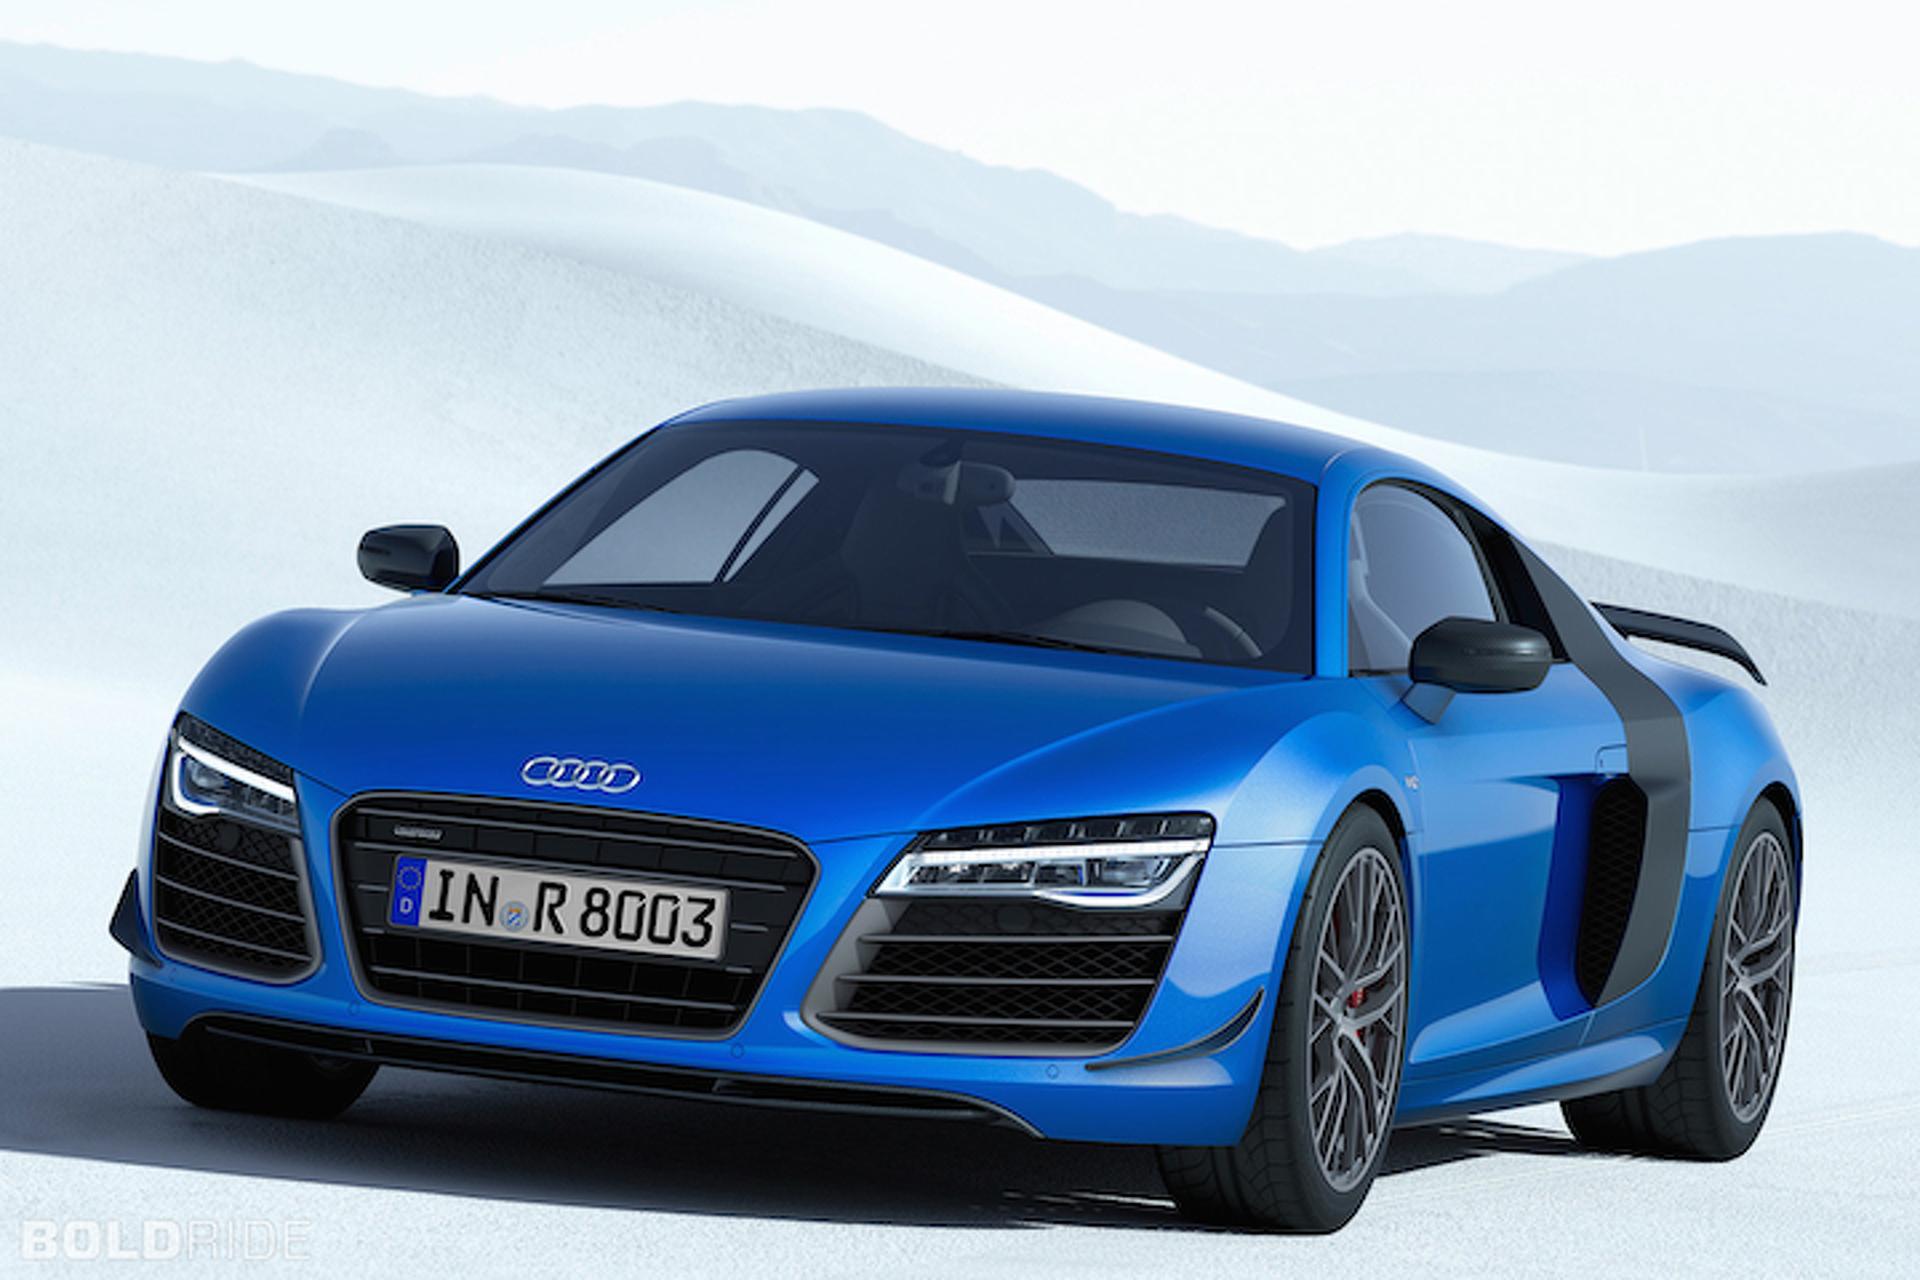 Audi R8 LMX Features World's First Laser Headlights